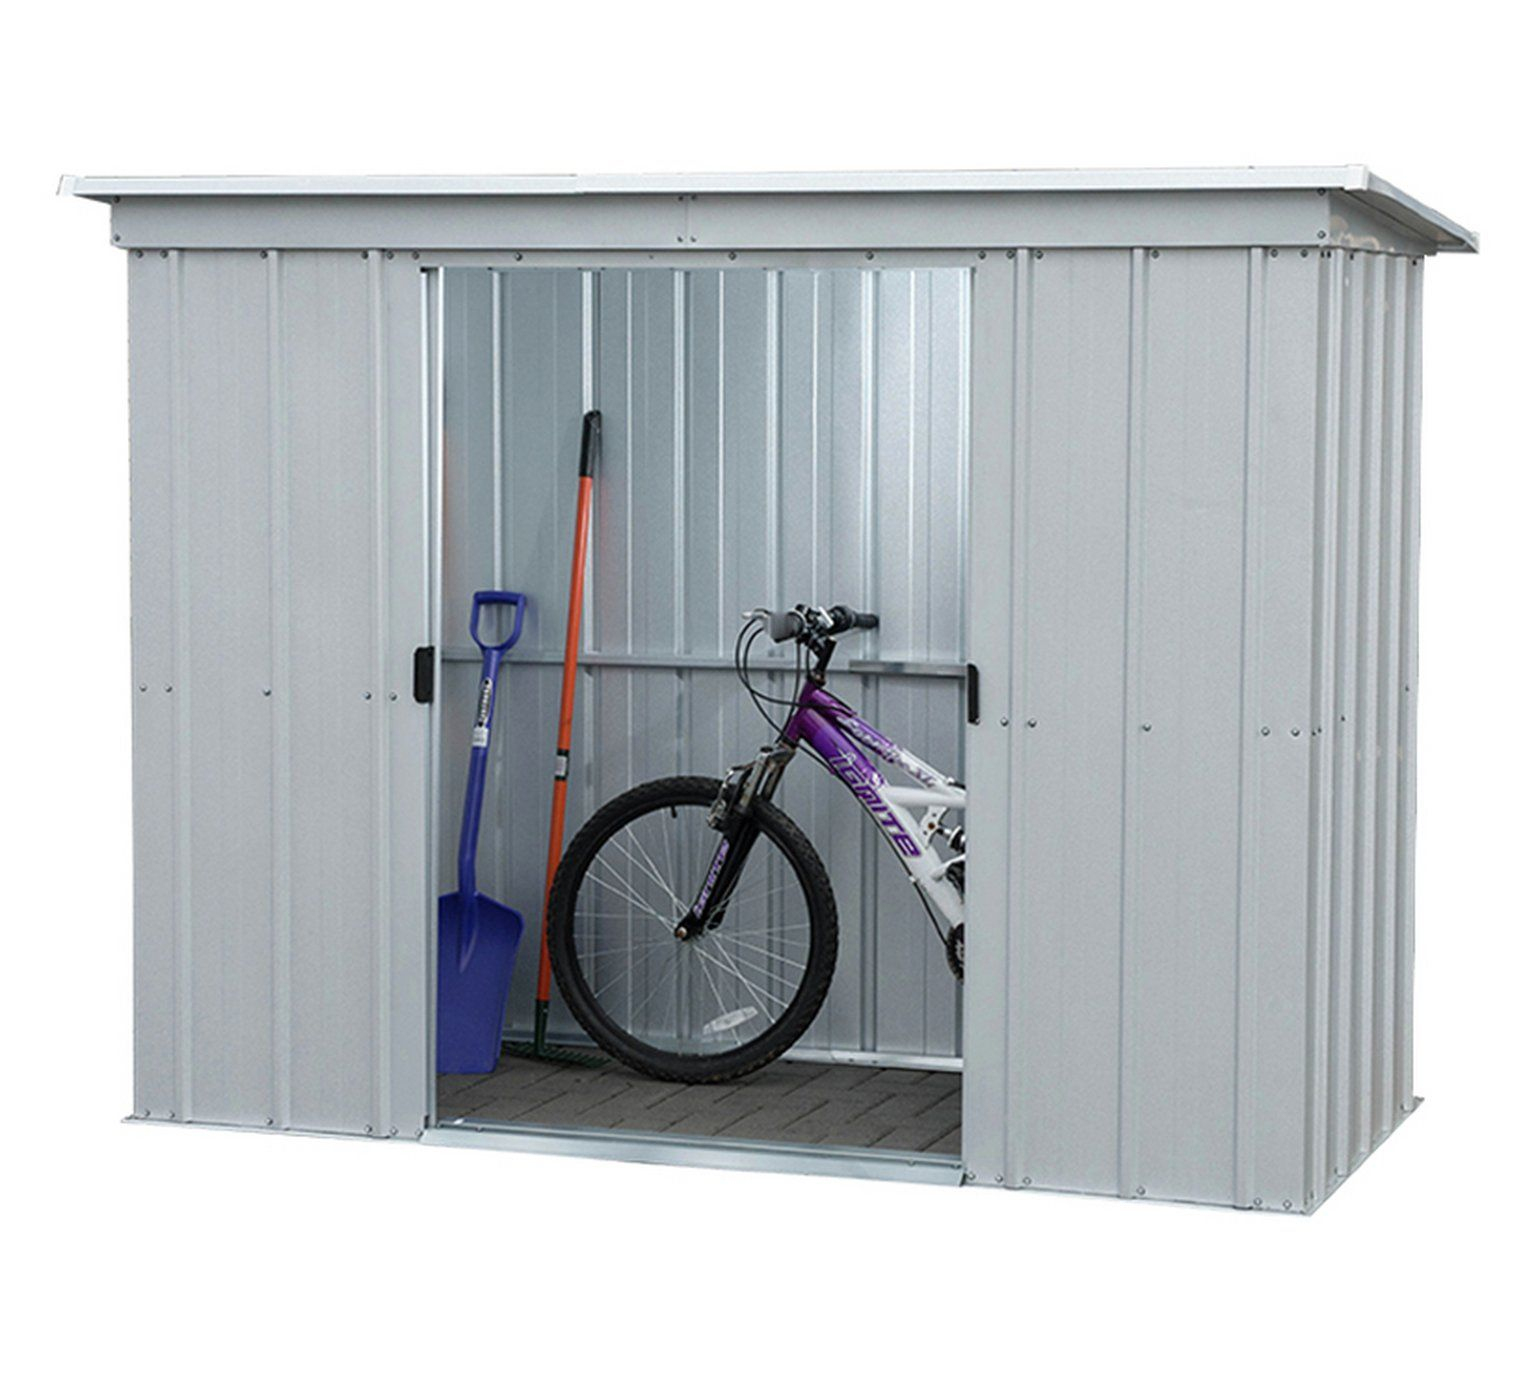 Yardmaster 10 X 4 Pent Metal Shed | Garden Storage Shed ... concernant Trigano Abri De Jardin